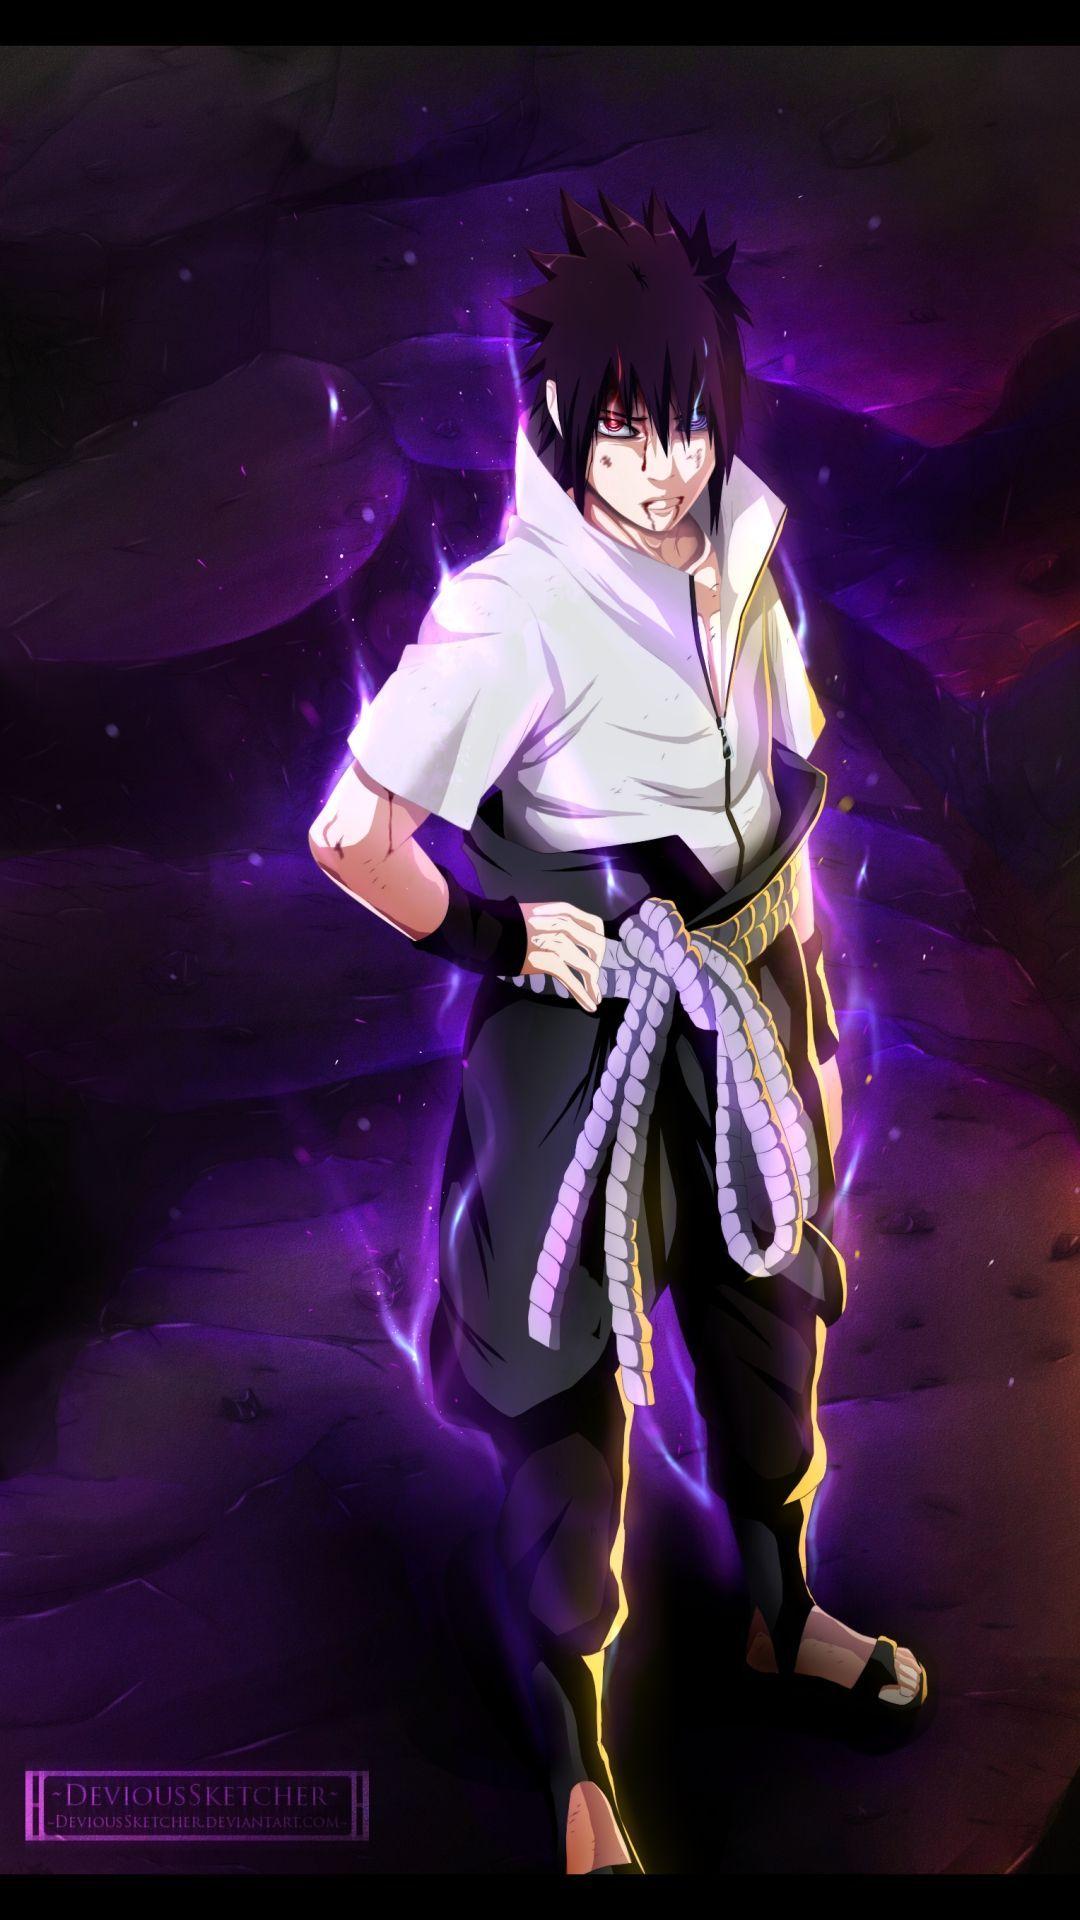 Sasuke iPhone Wallpapers   Top Sasuke iPhone Backgrounds 1080x1920